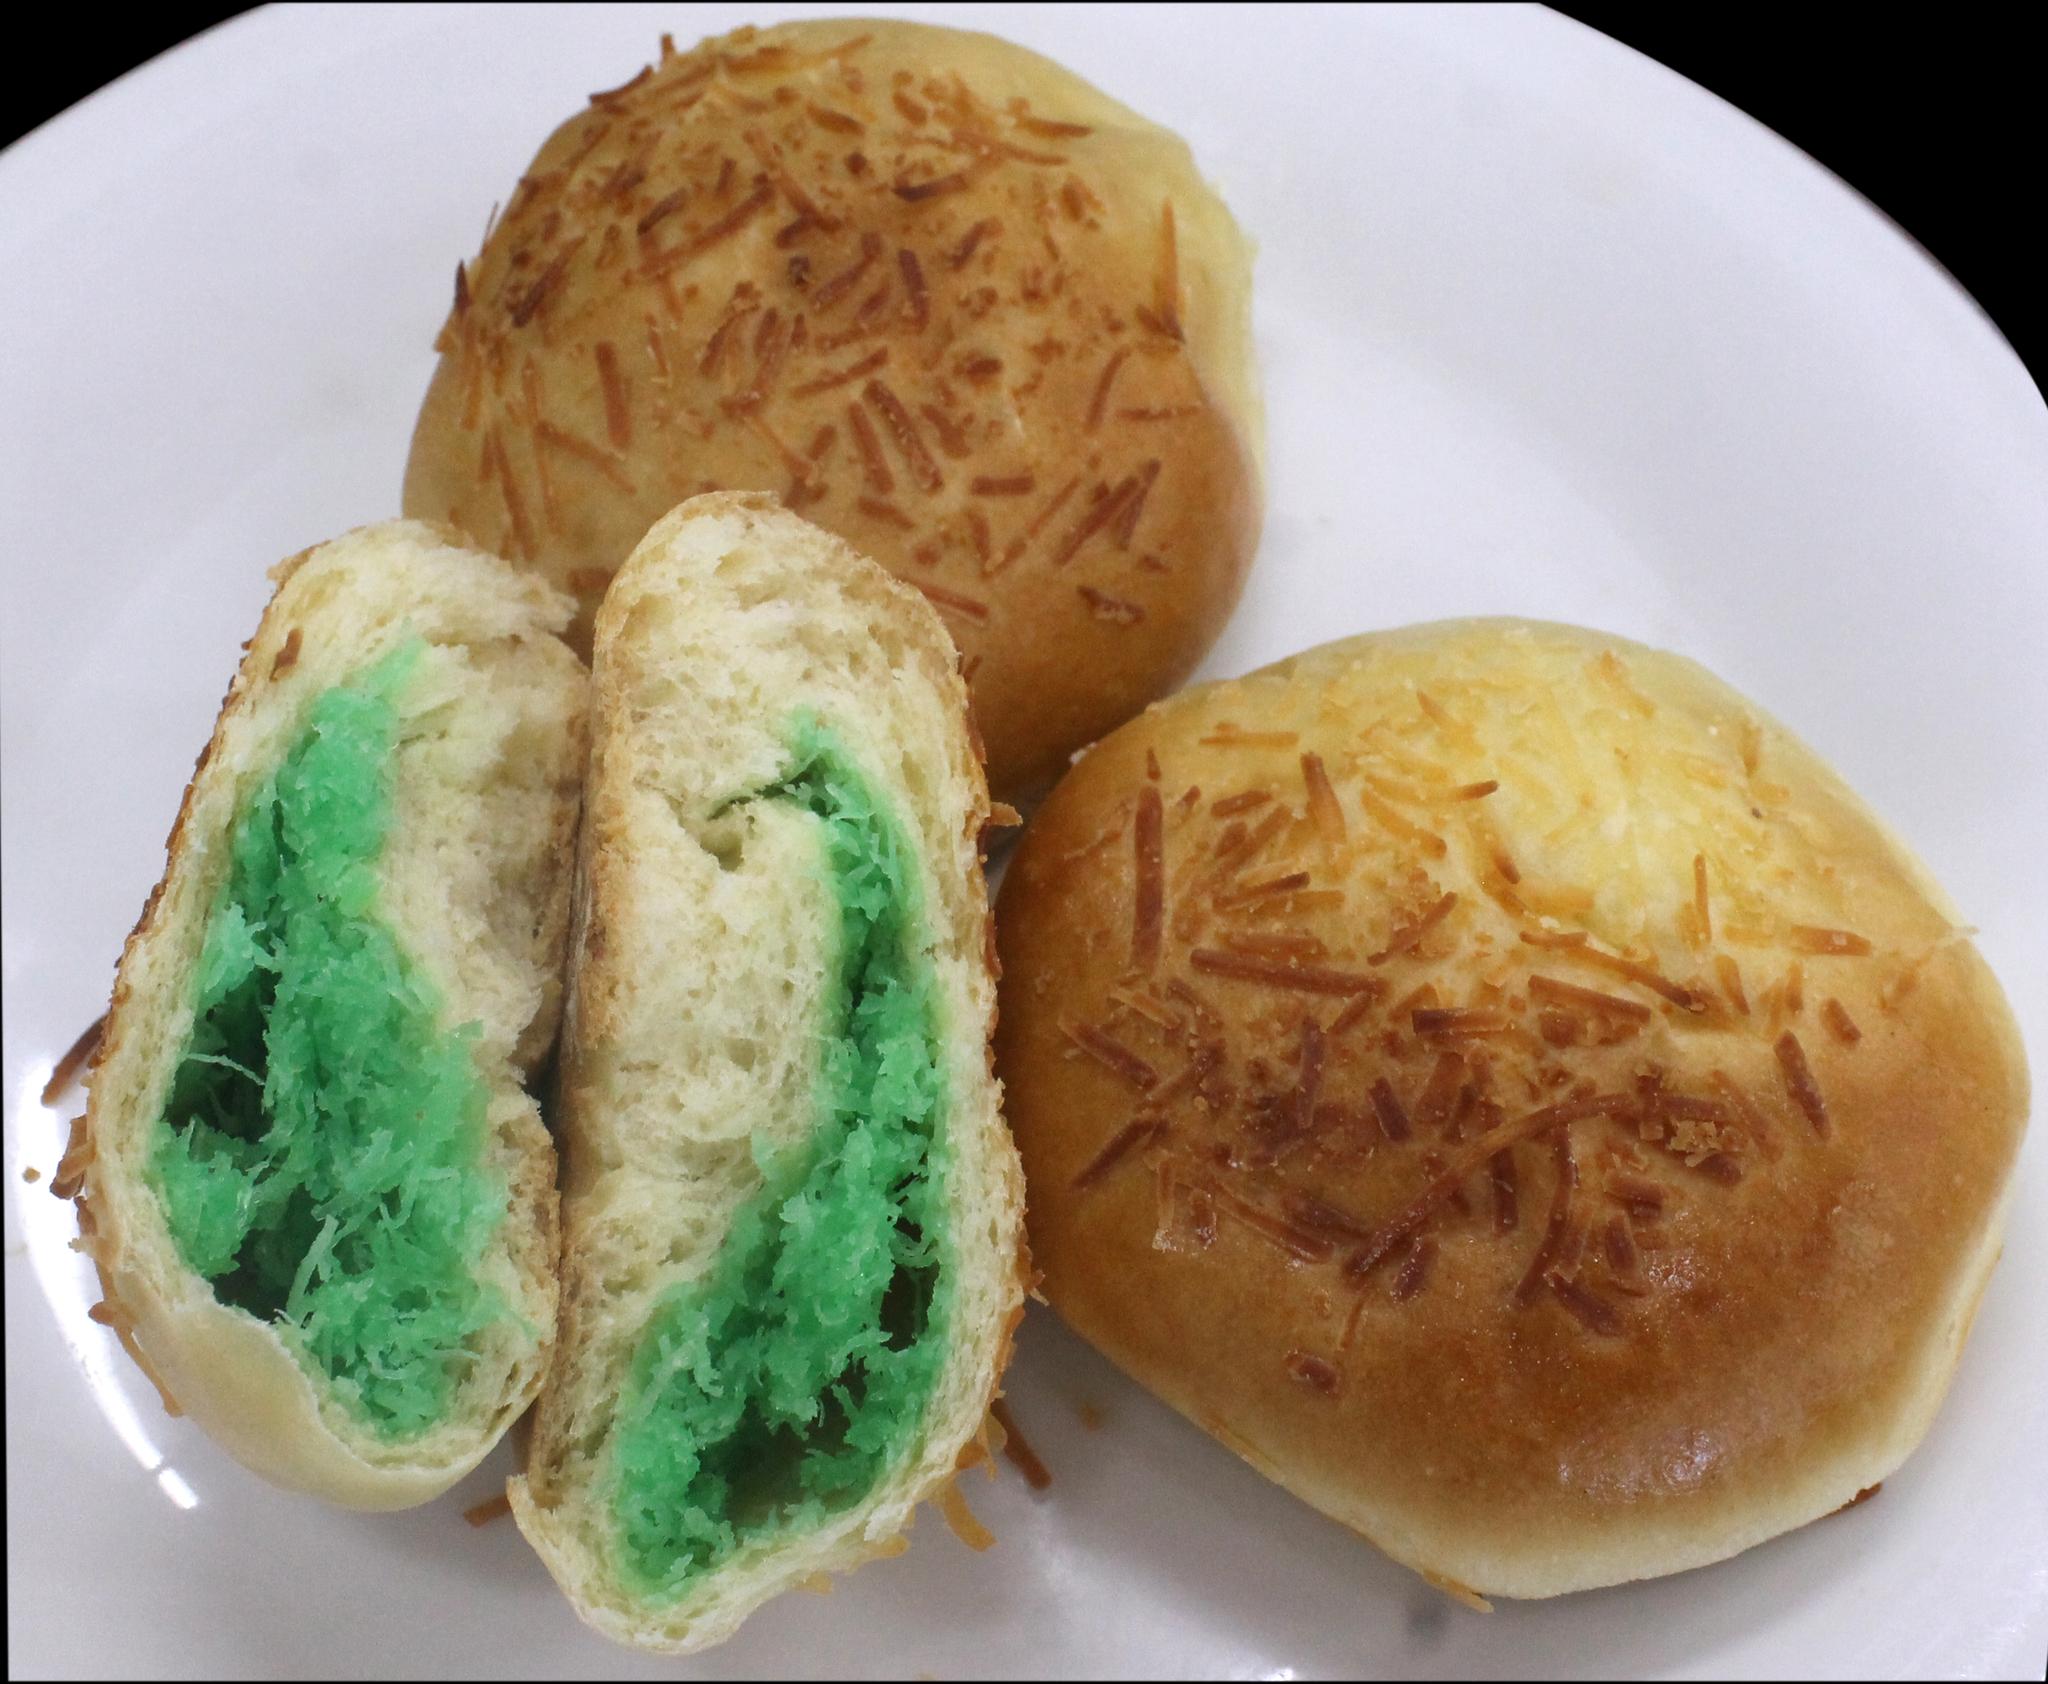 resep roti manis isi kelapa